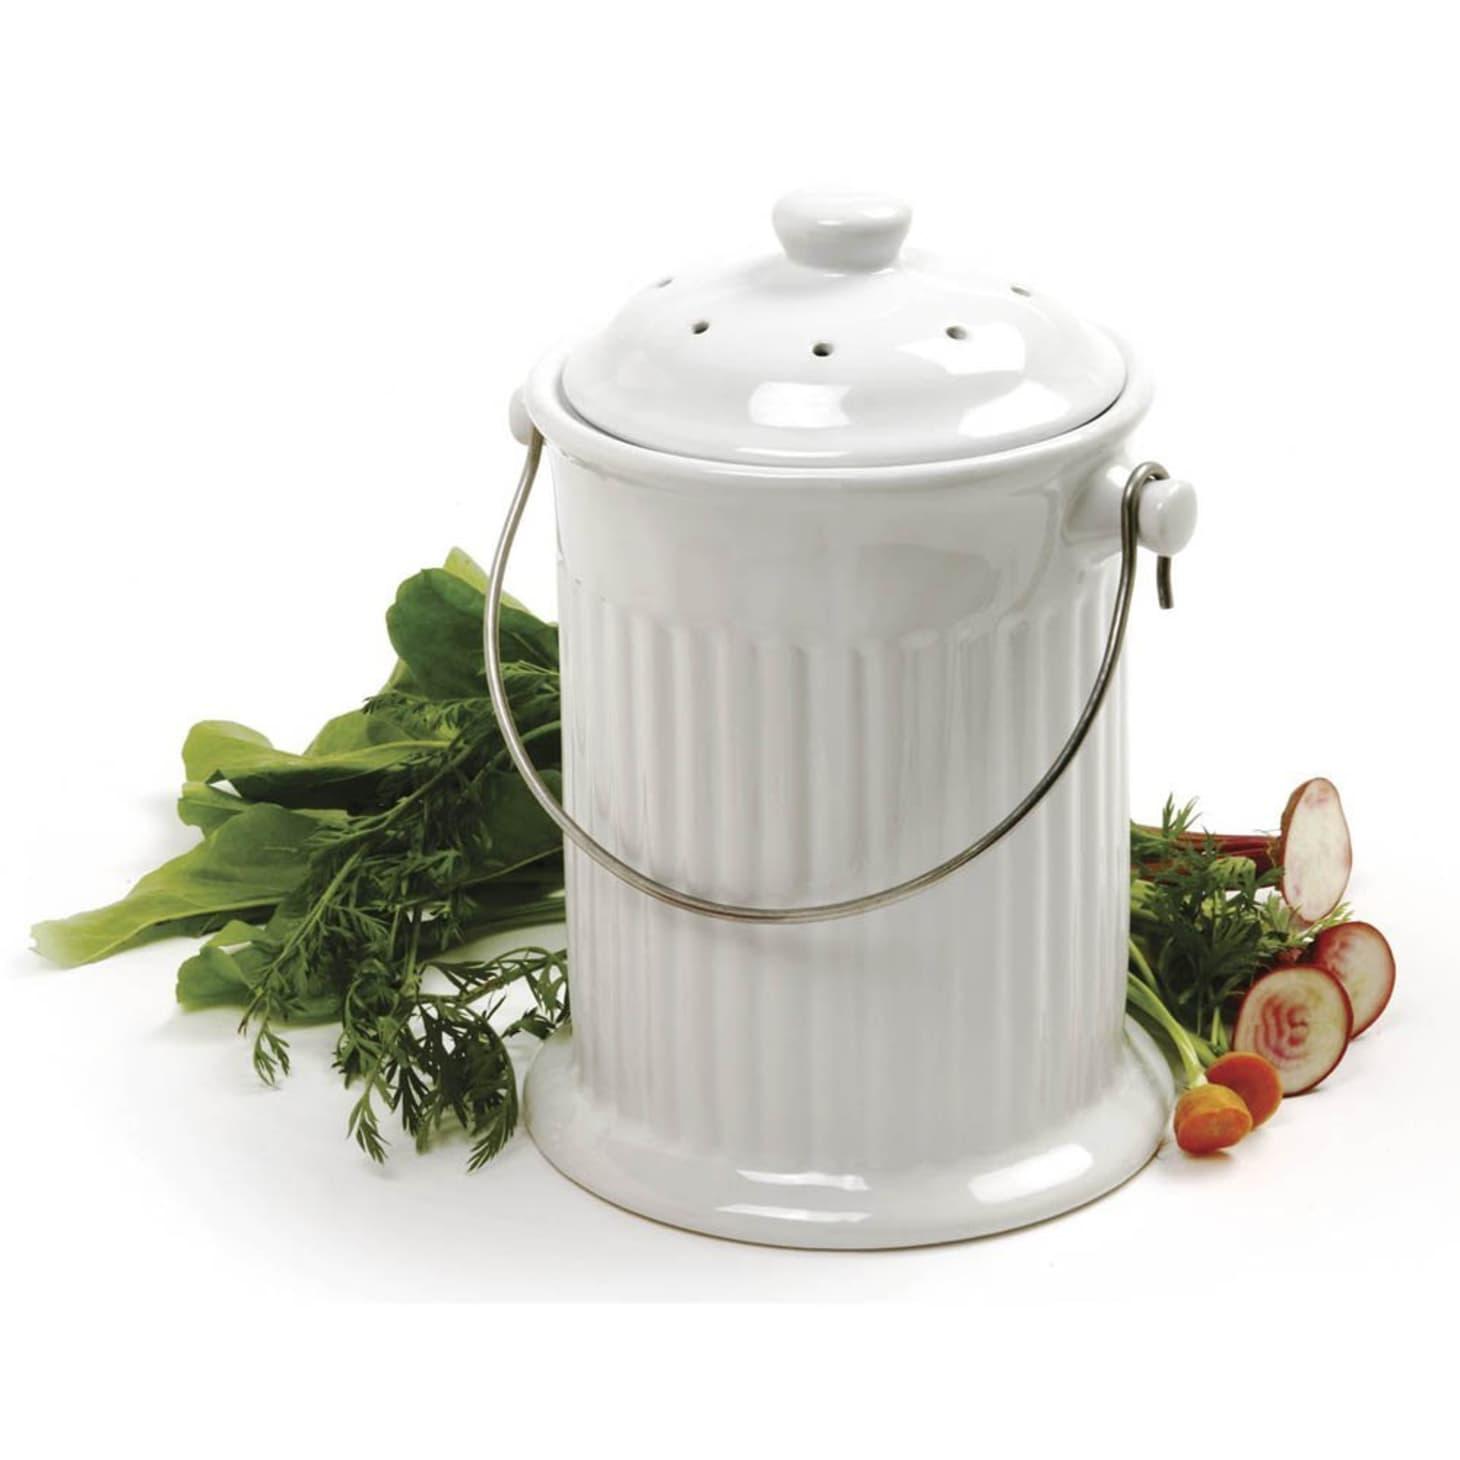 The Best Looking Indoor Composting Bins for Your Kitchen ...